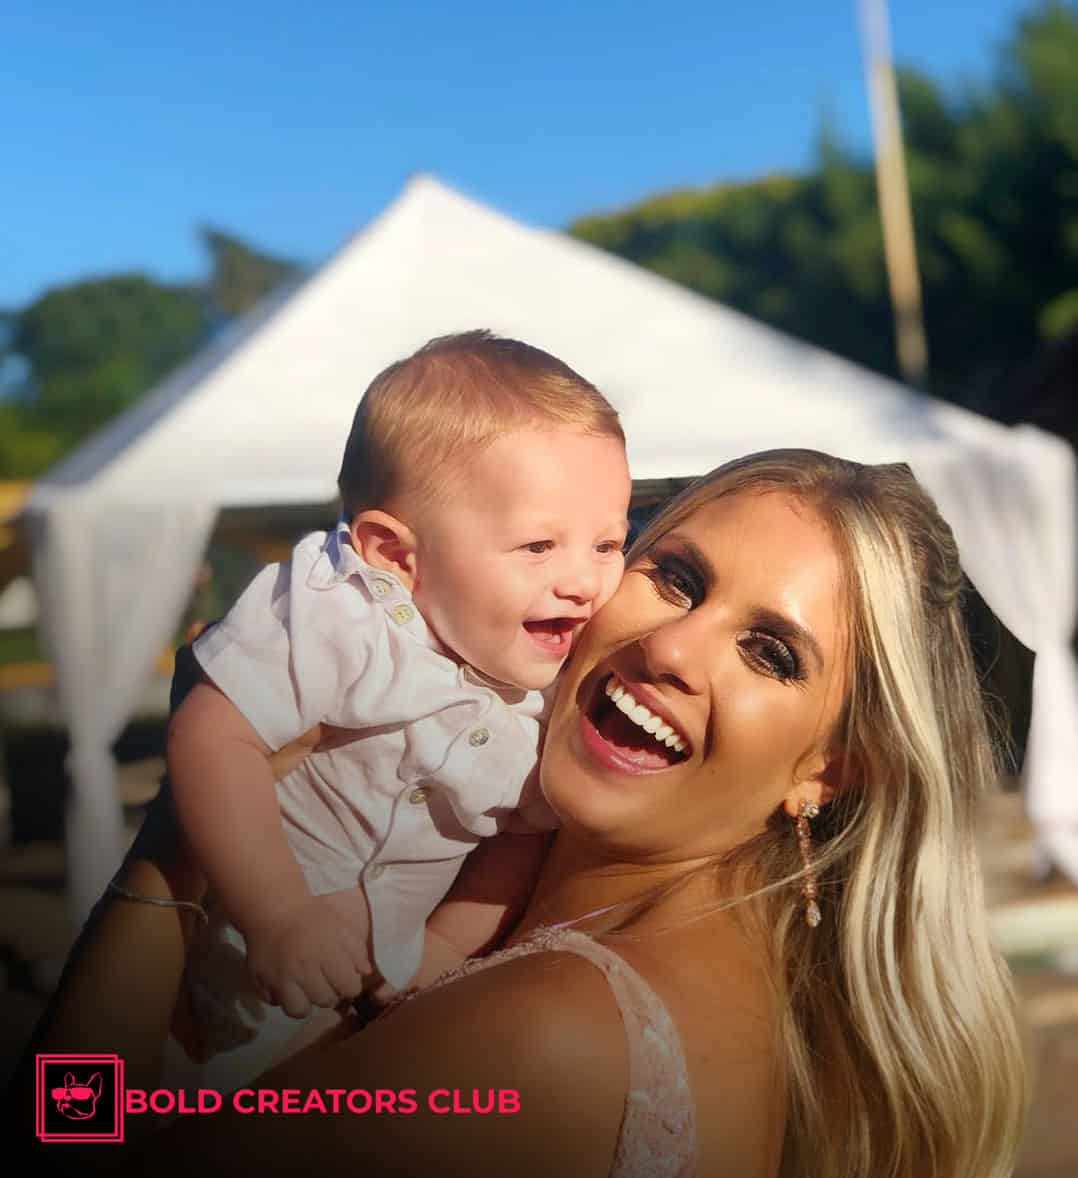 Babi Sabbag Bold Creators Club Influencer Marketing Agency South America Brazil